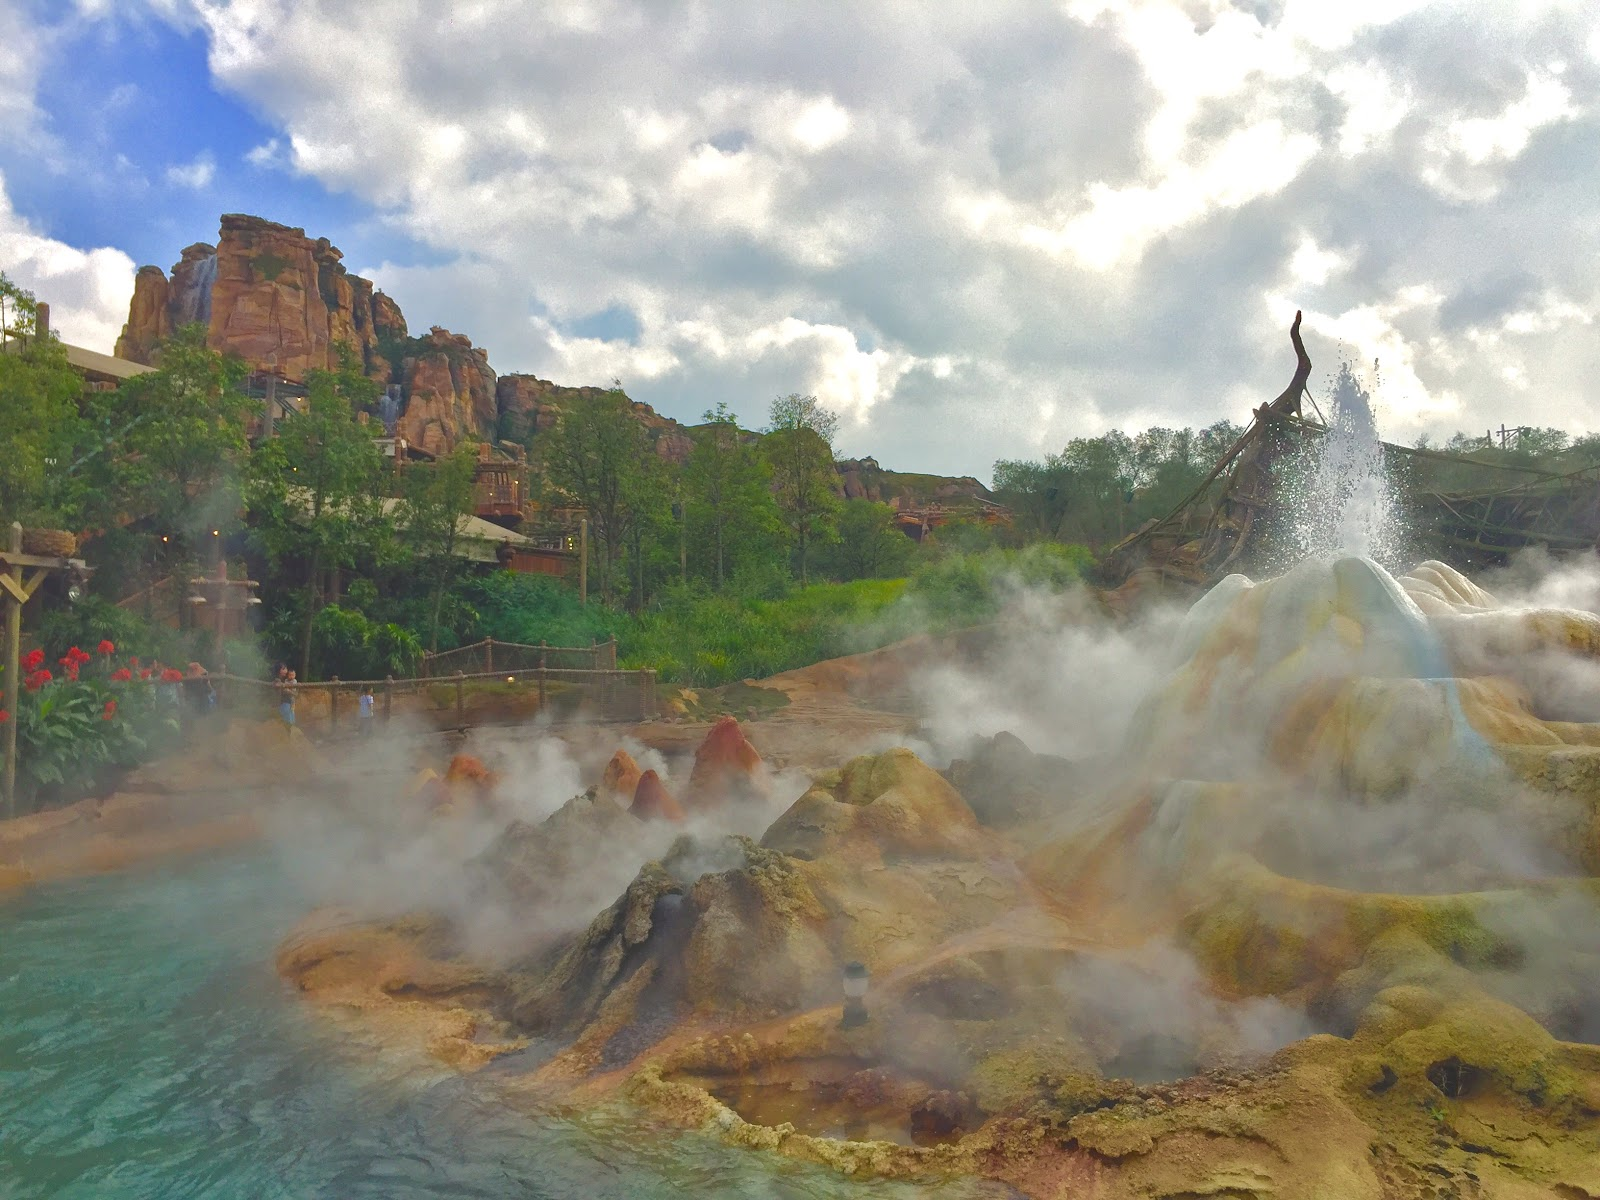 Shanghai Disneyland Roaring Mountain Rapids